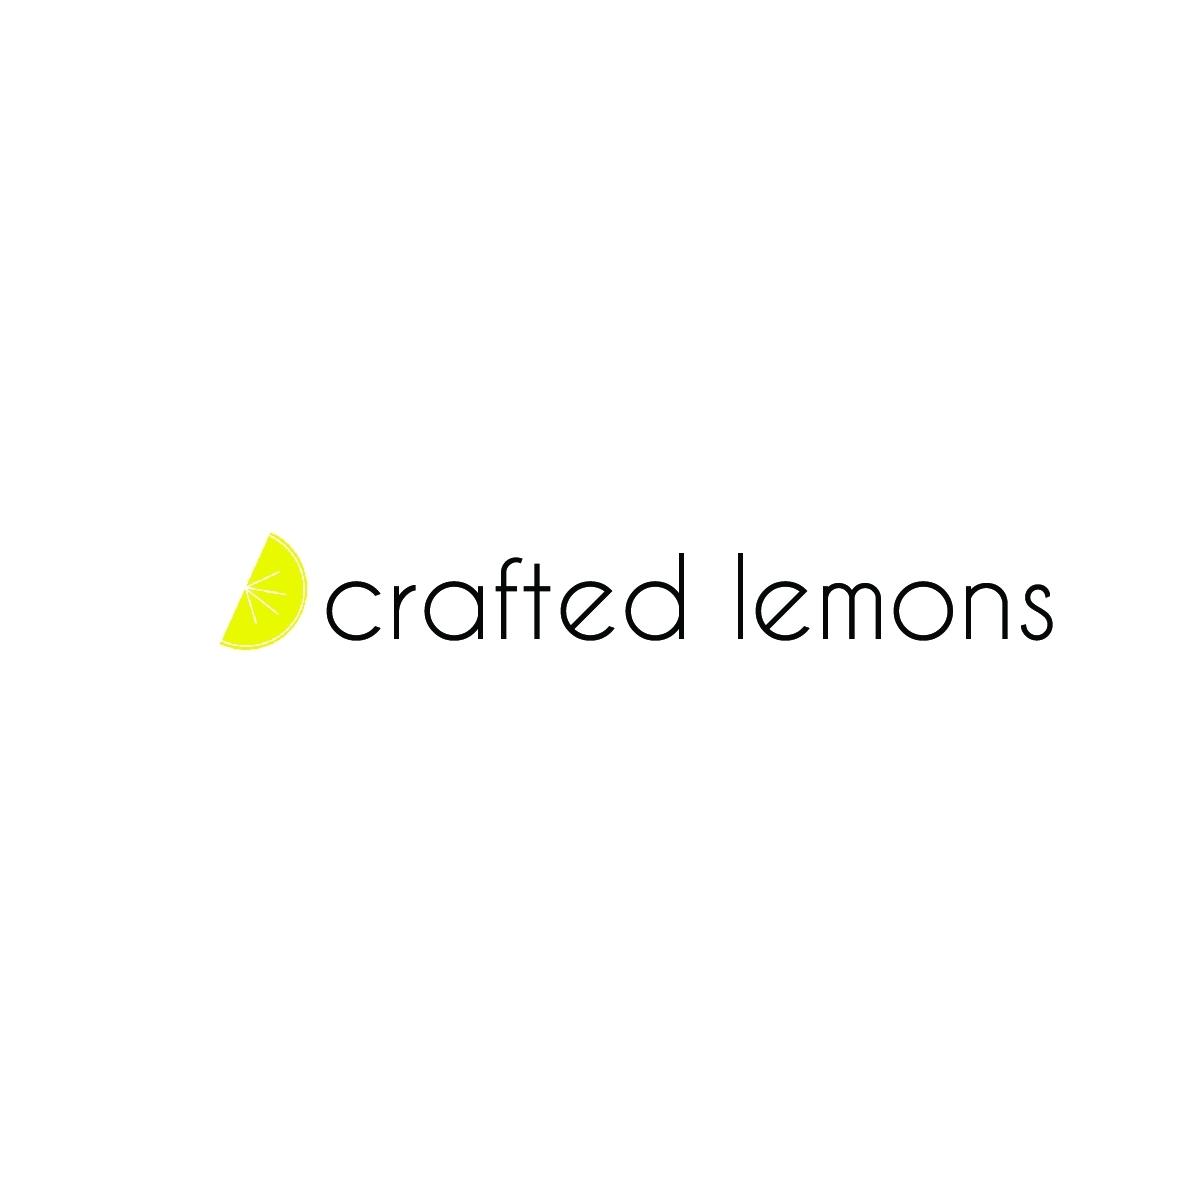 Crafted Lemons White Background Logo-01.jpg